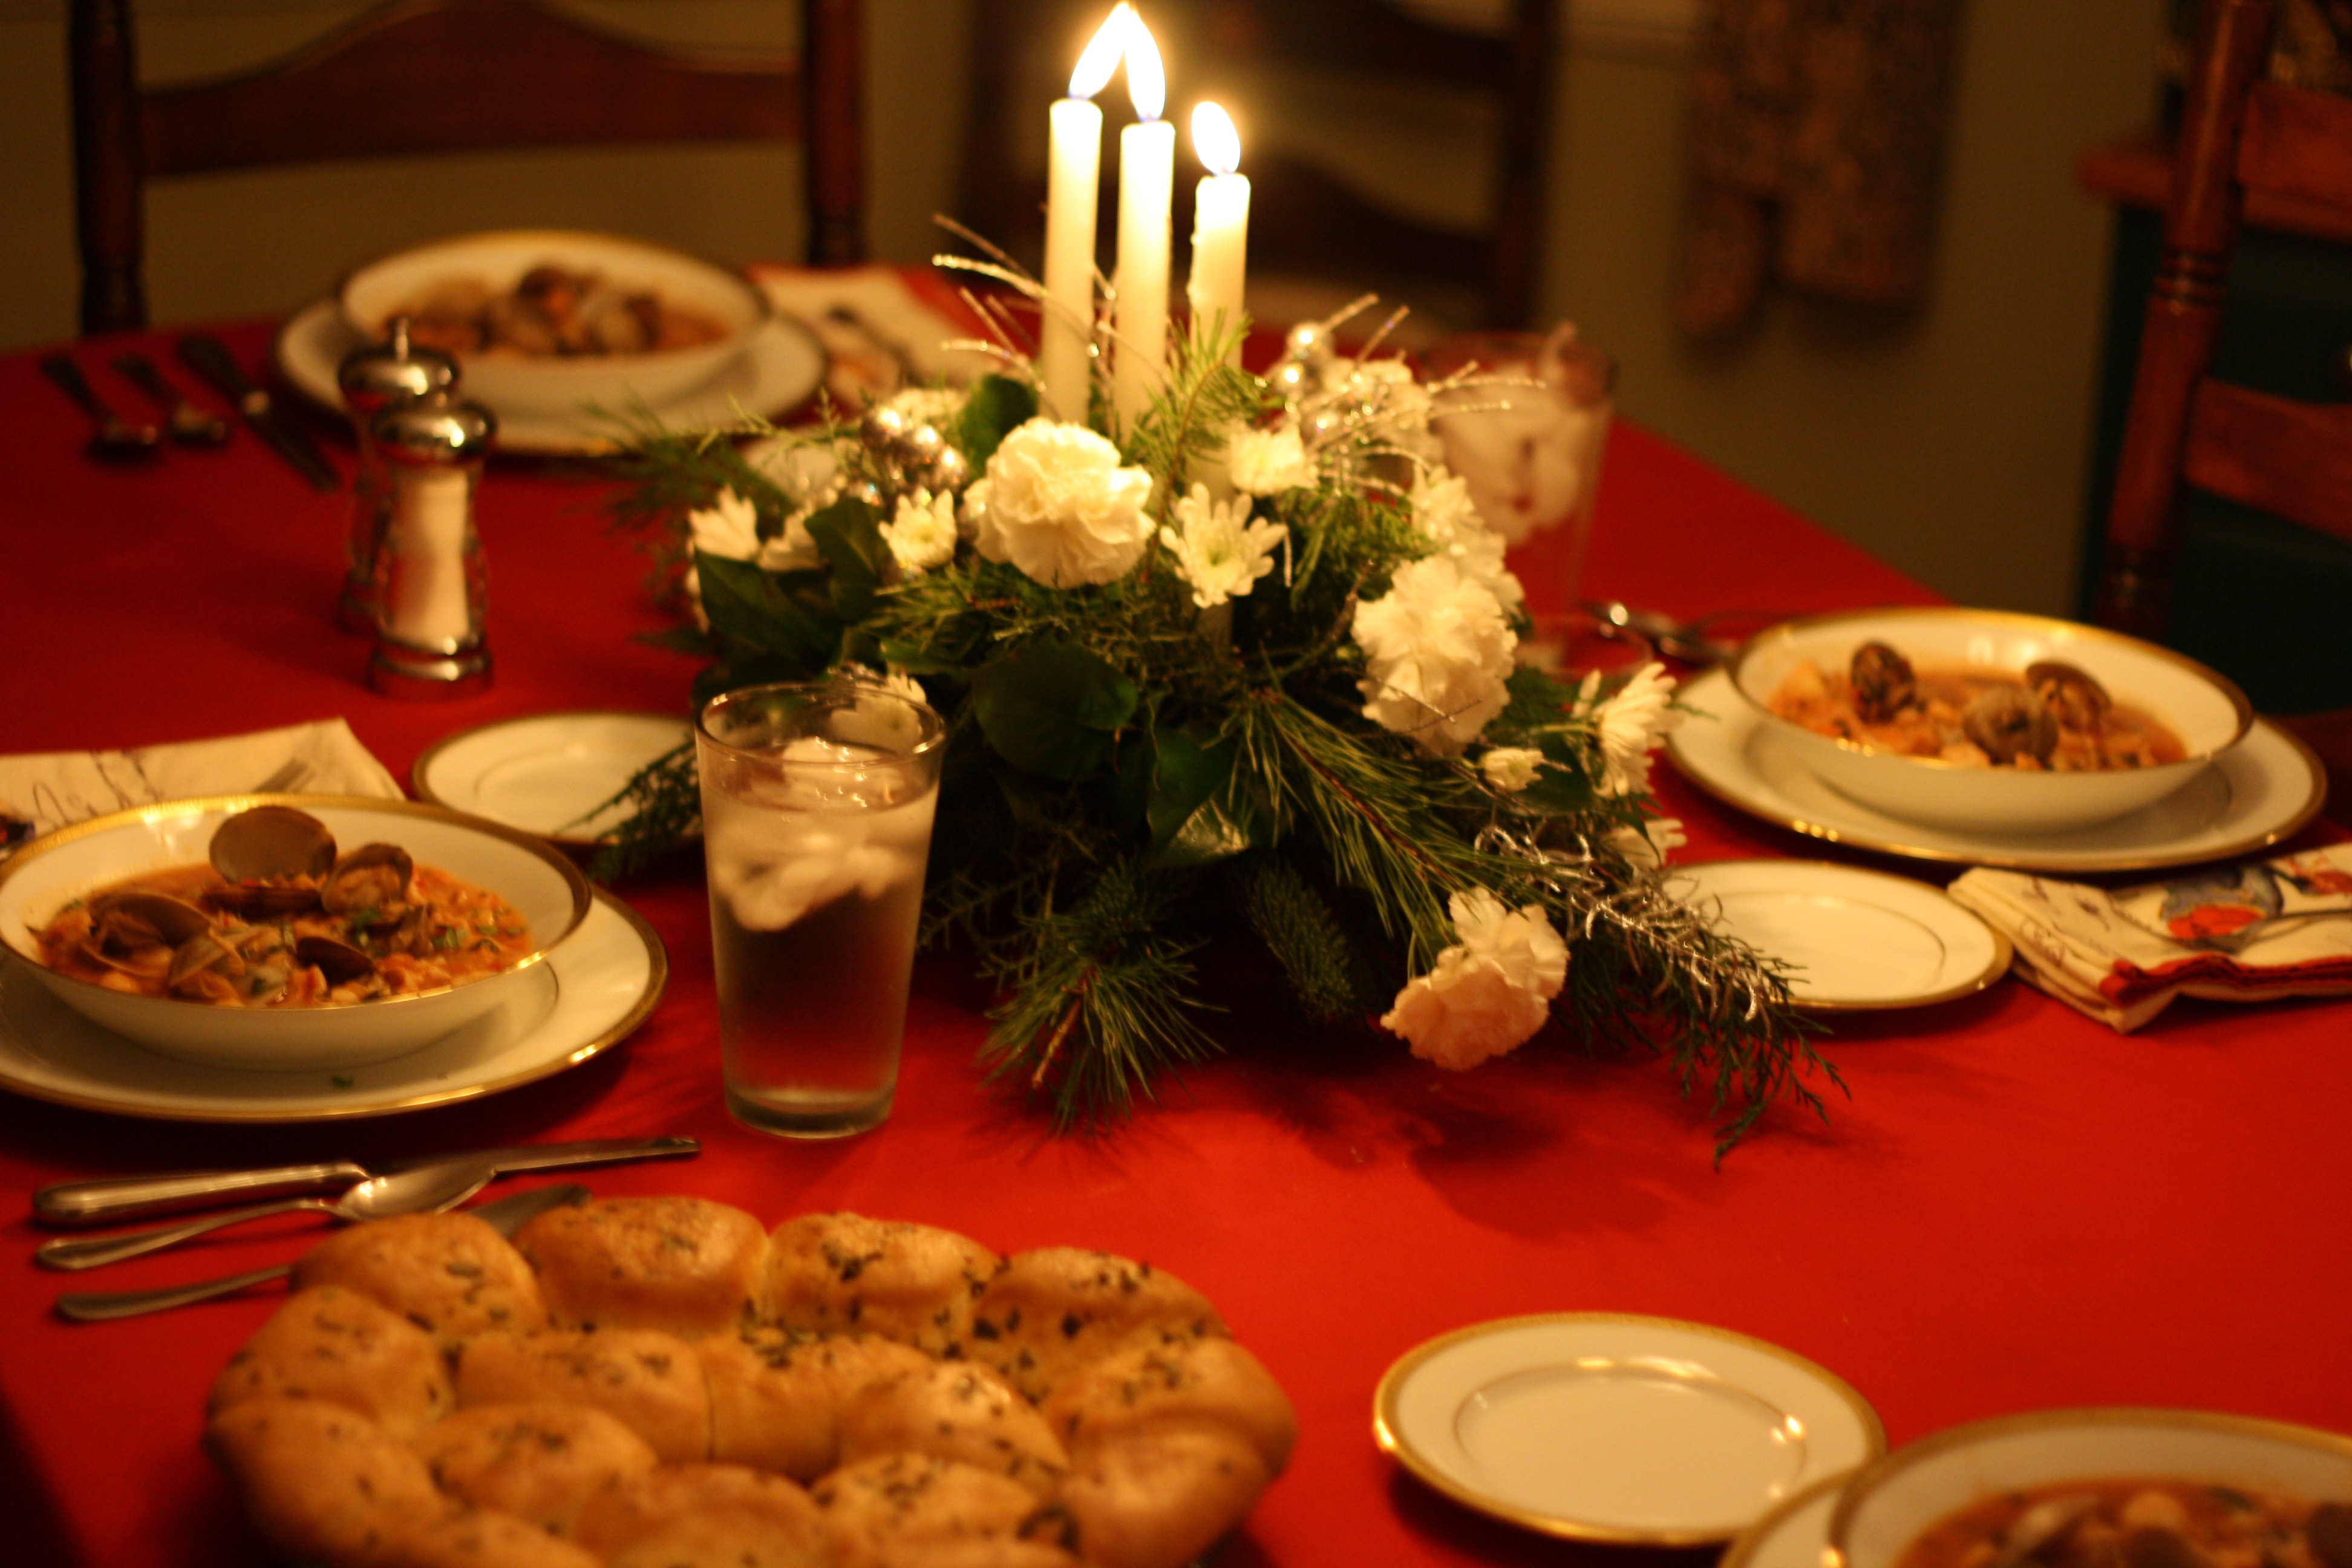 Christmas Eve Dinner  Christmas Eve 2009 – Bouillabaisse